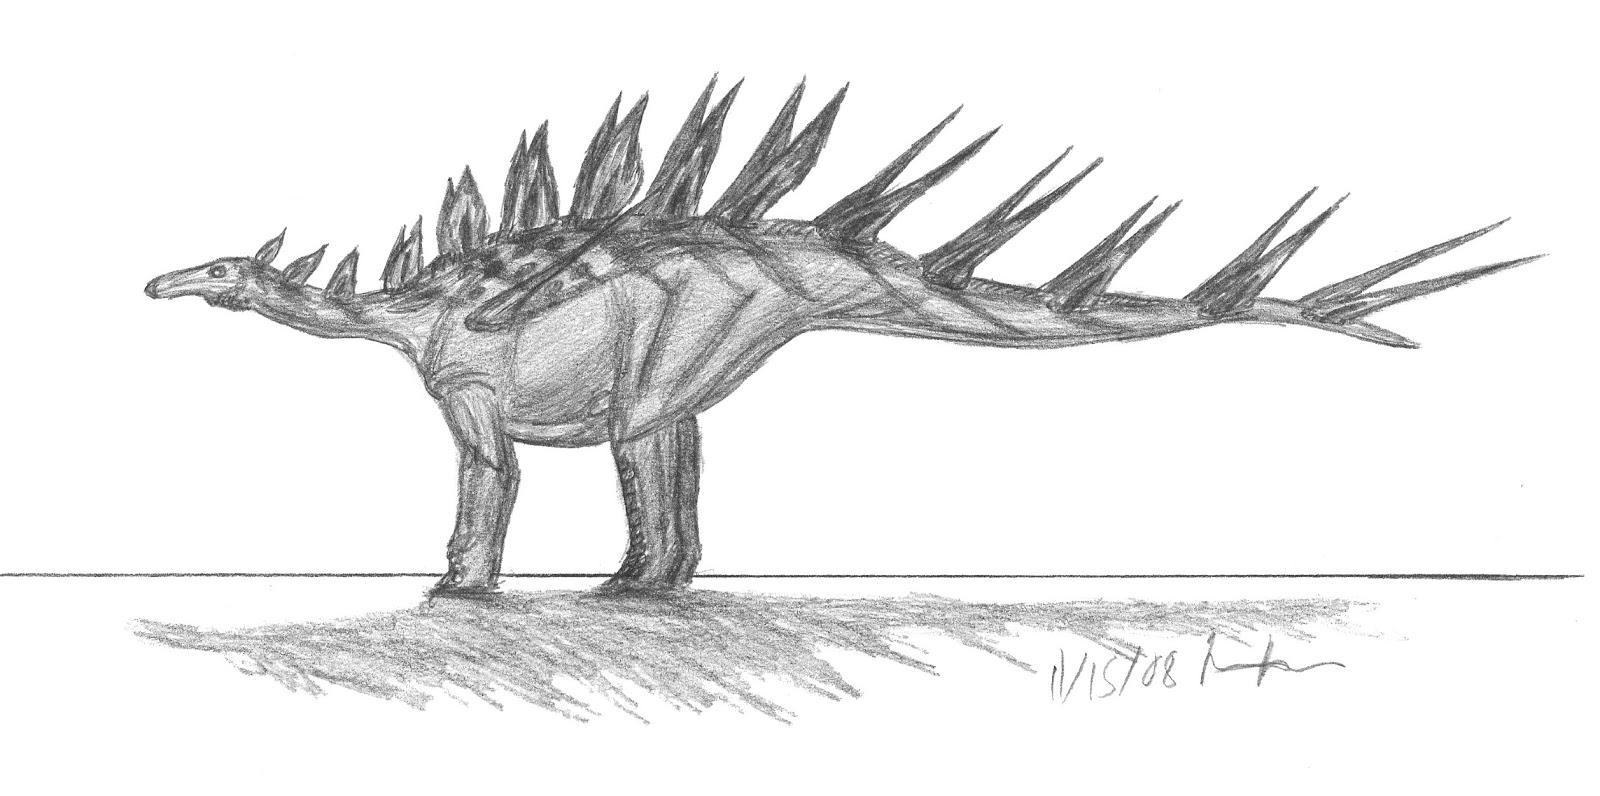 kentrosaurus coloring pages - photo#24